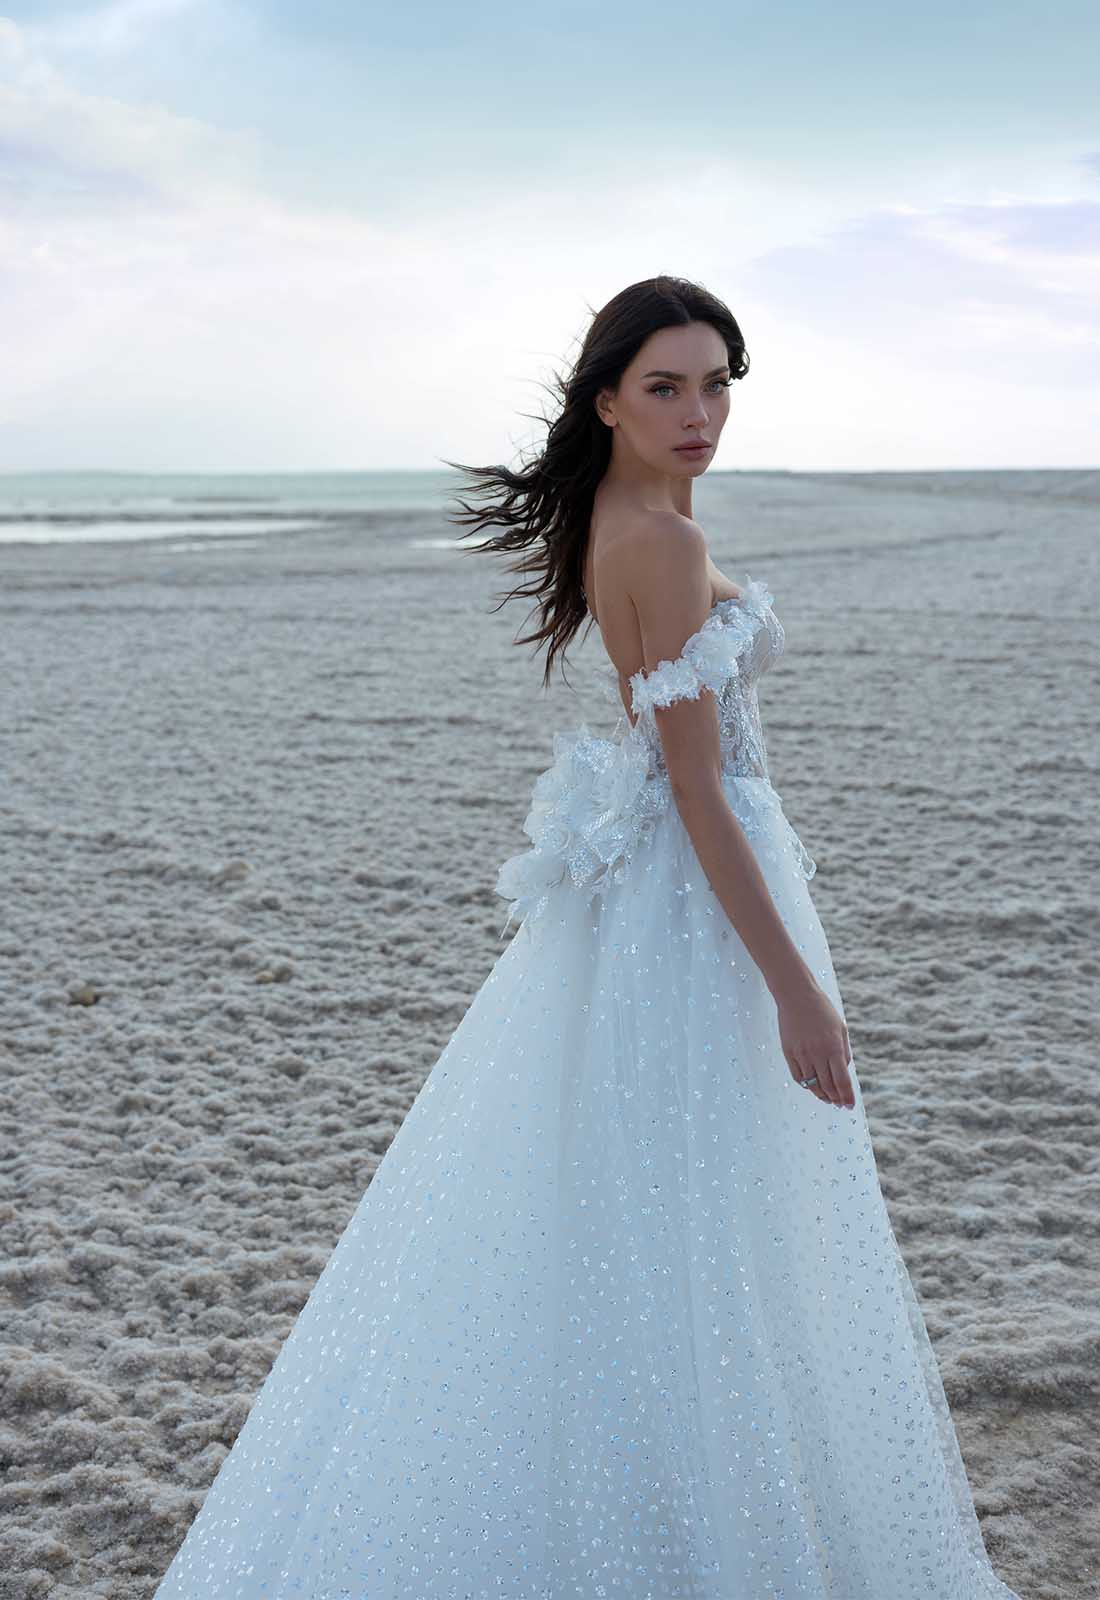 4130cb6f5f8 PNINA TORNAI. Pnina Tornai is a globally renowned couture bridal ...